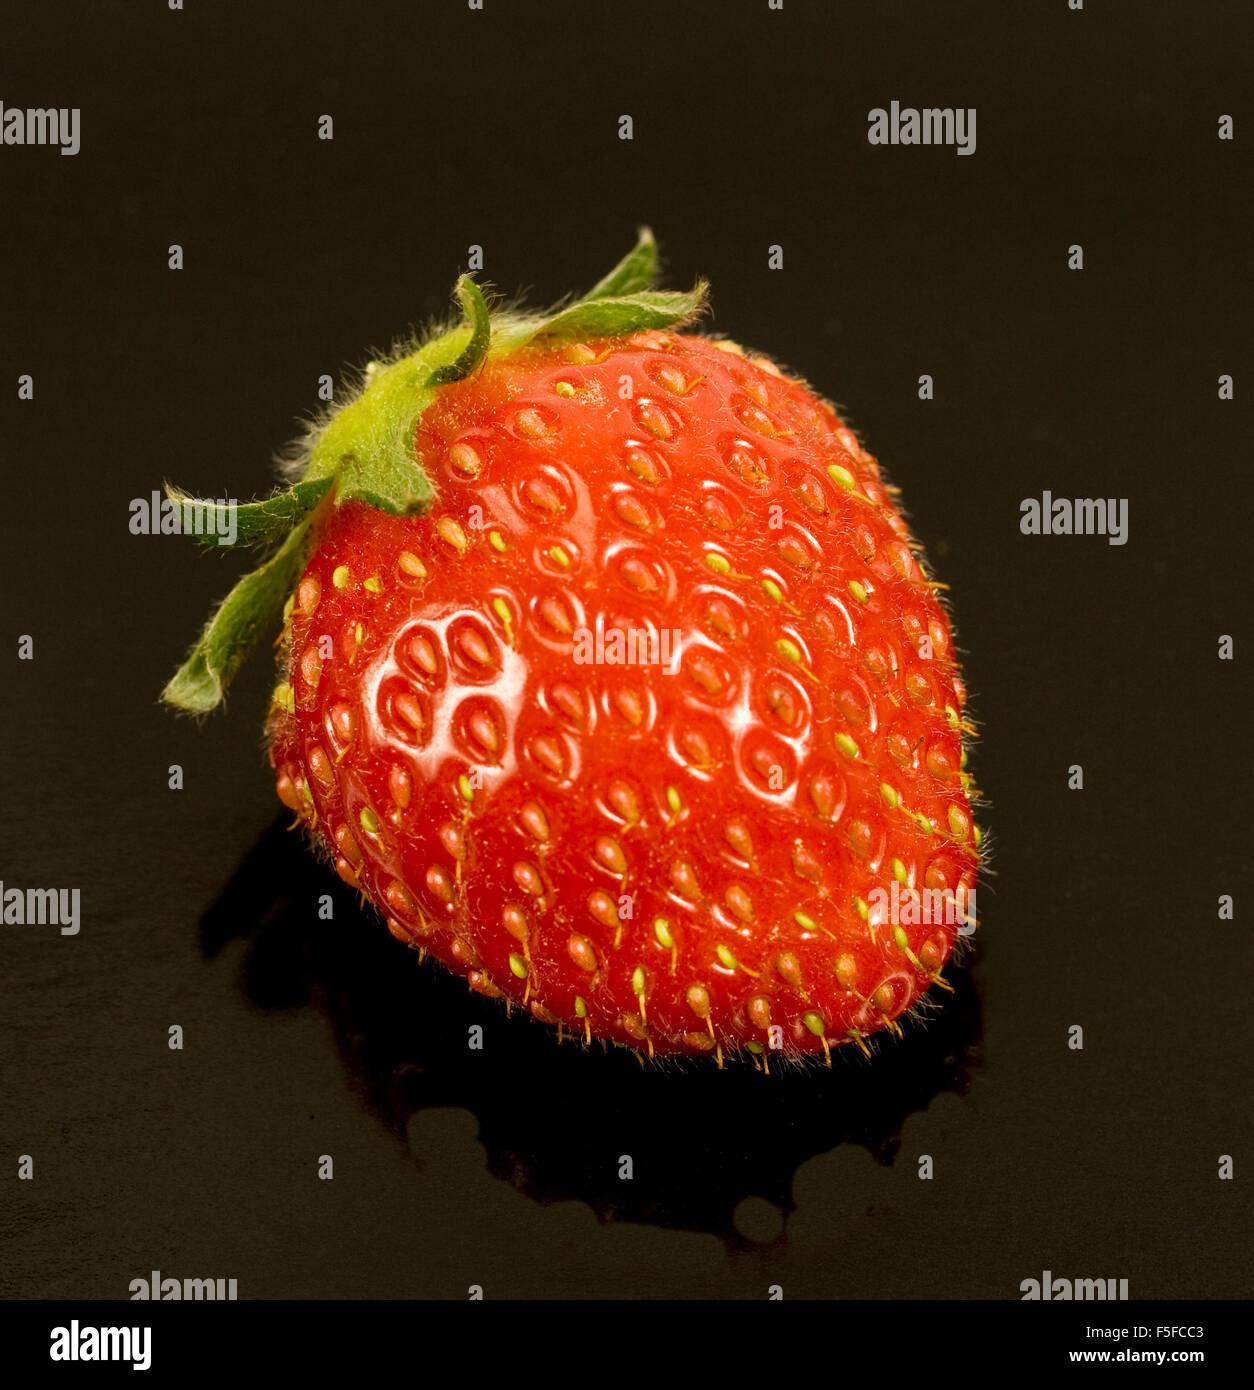 Strawberry on Black Background Stock Photo